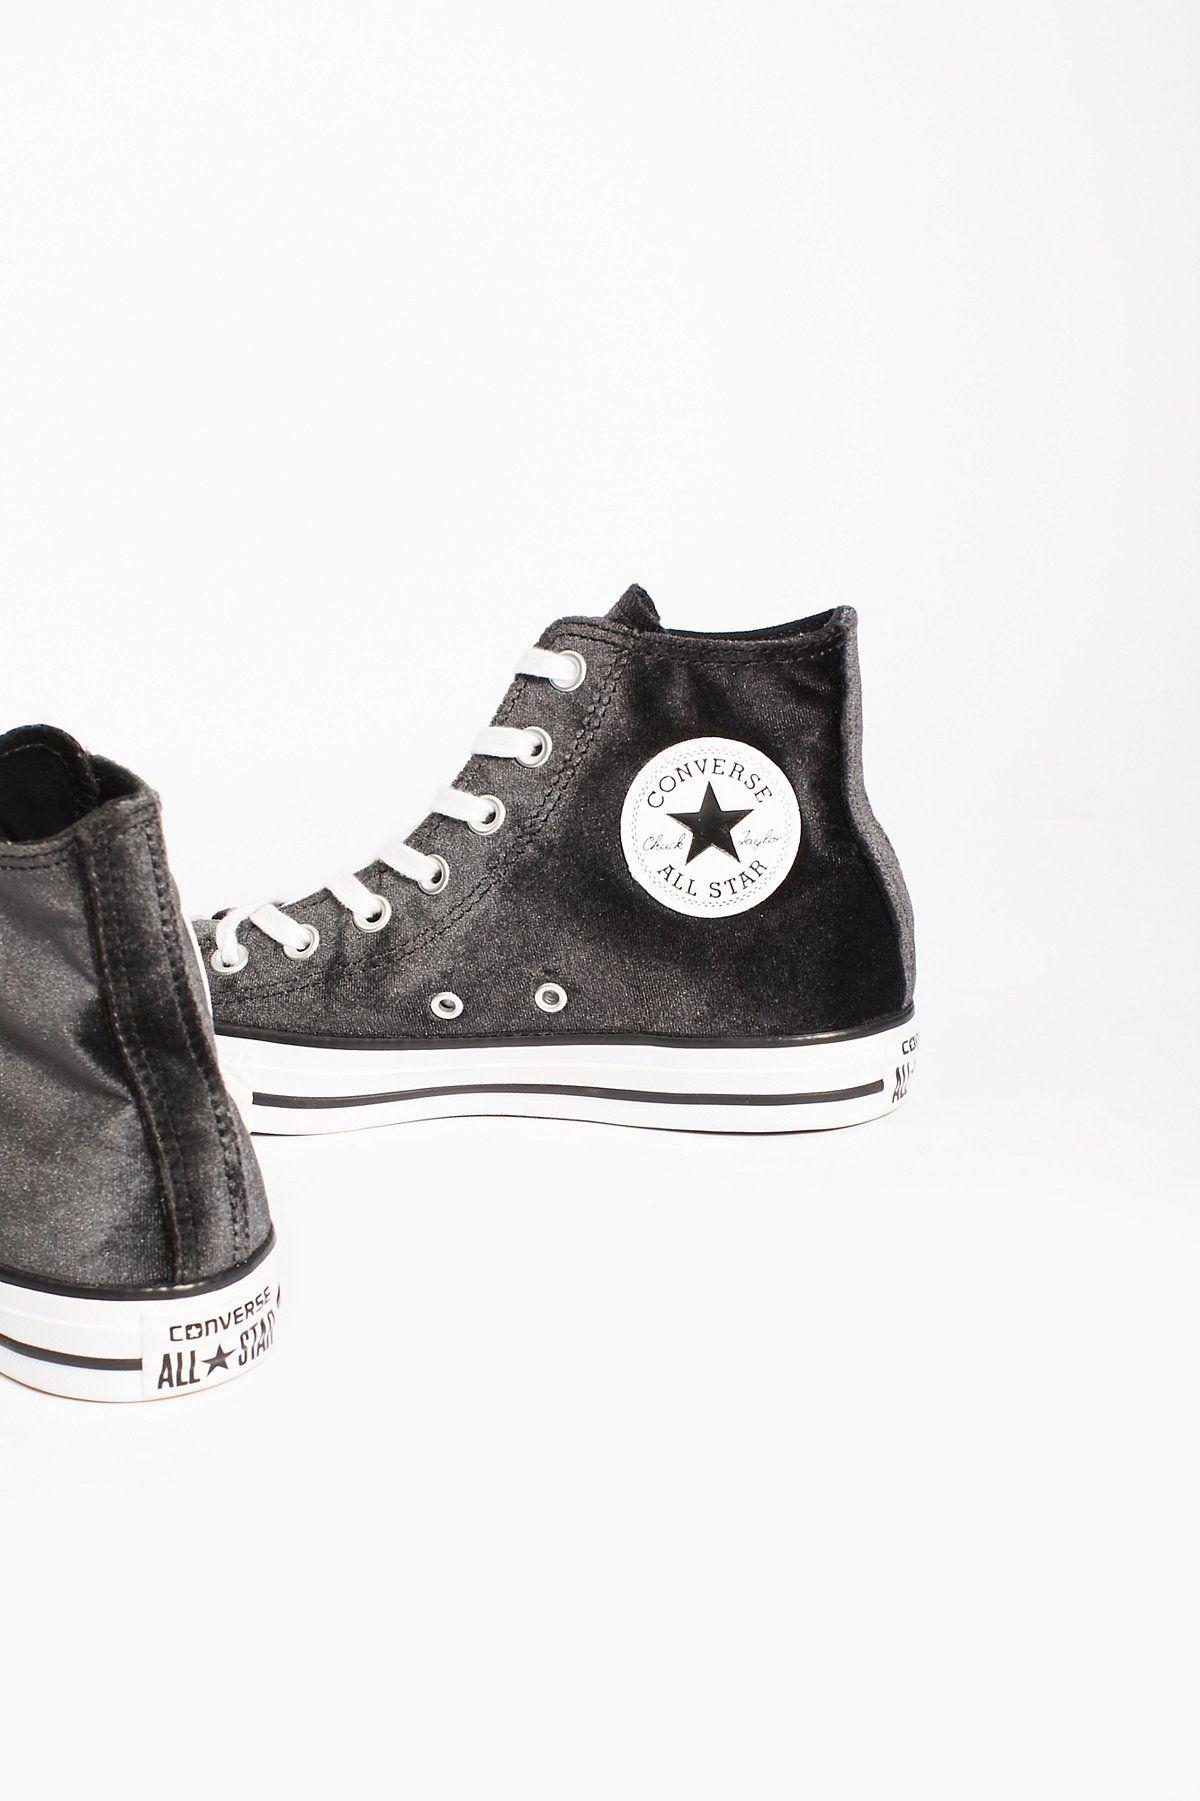 39 Best Collegiate Converses images | Converse sneakers